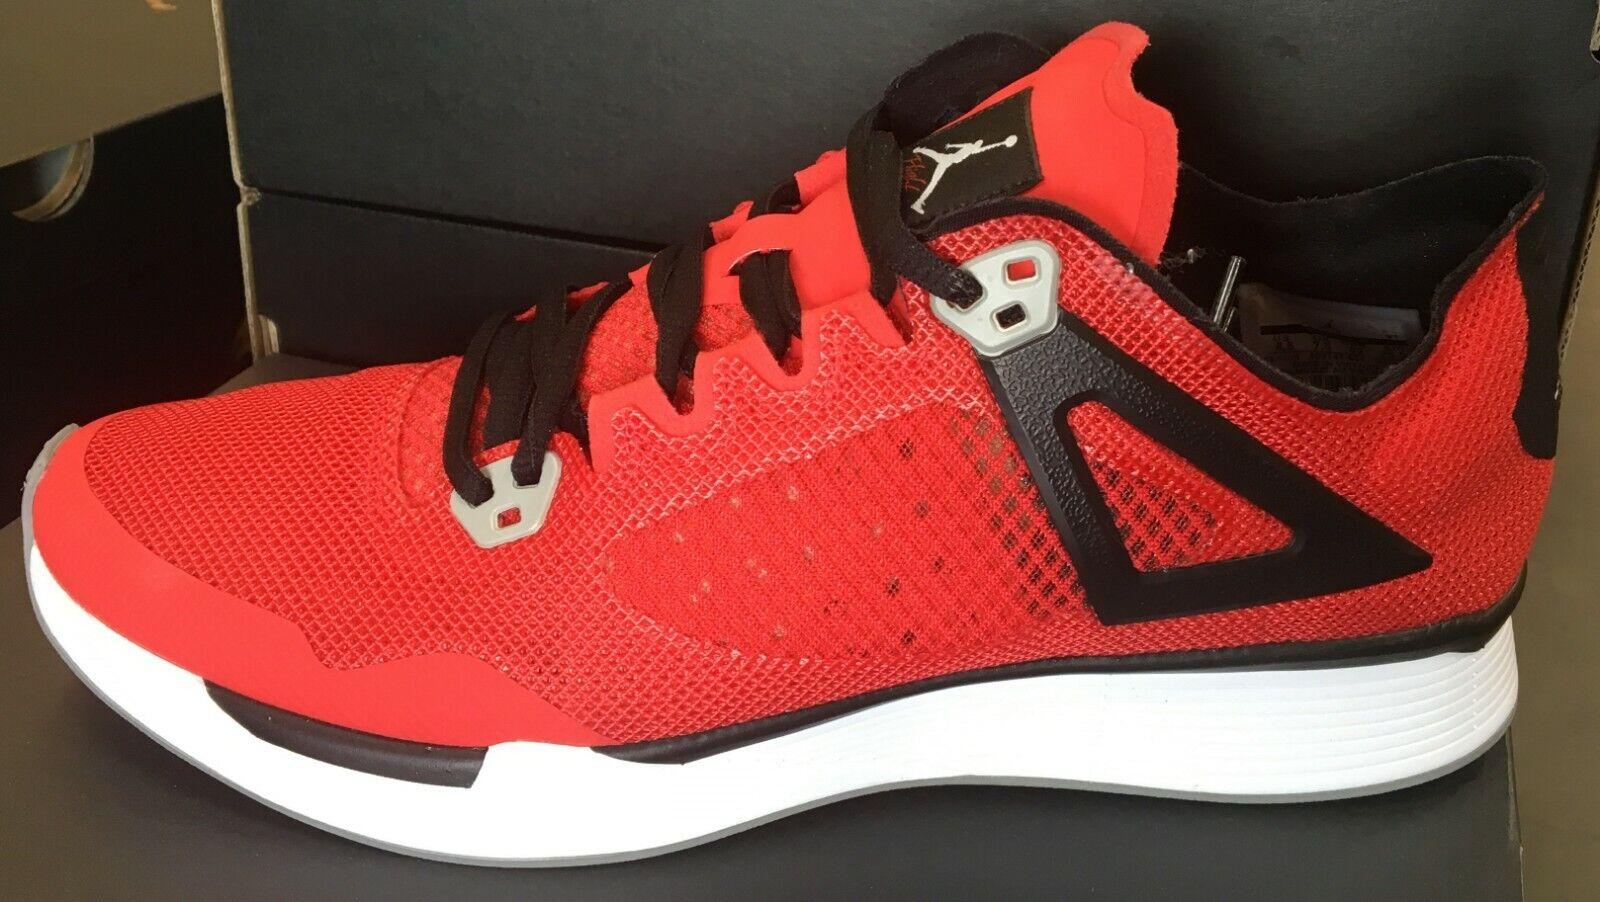 Jordan 89 Racer  Men's Running Basketball Training shoes  Red  AQ3747 600   K